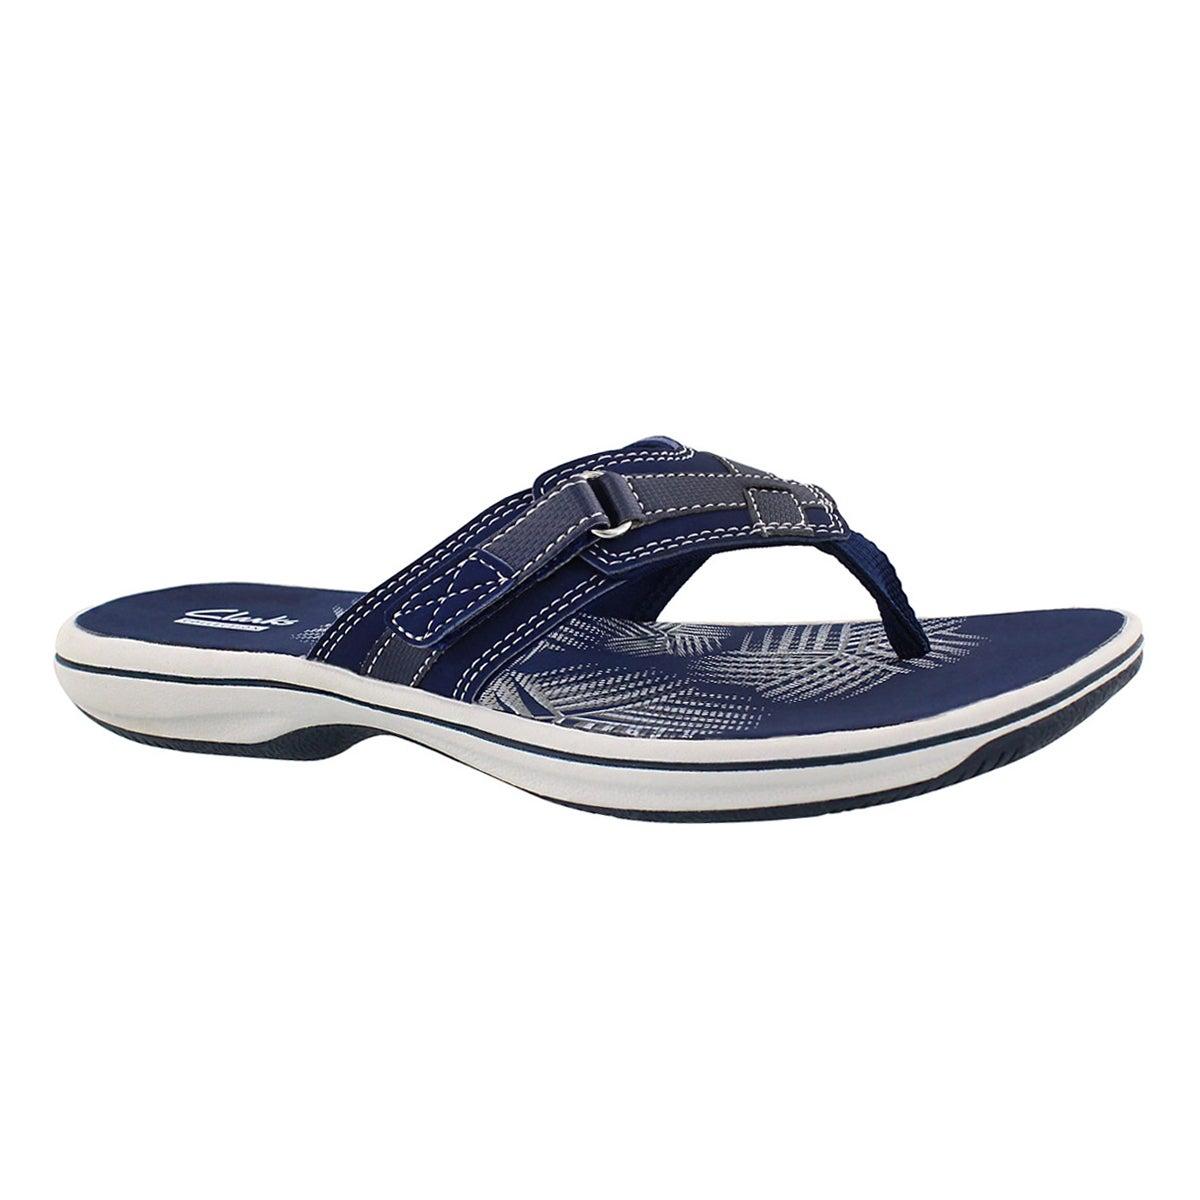 Women's BREEZE SEA navy thong sandals